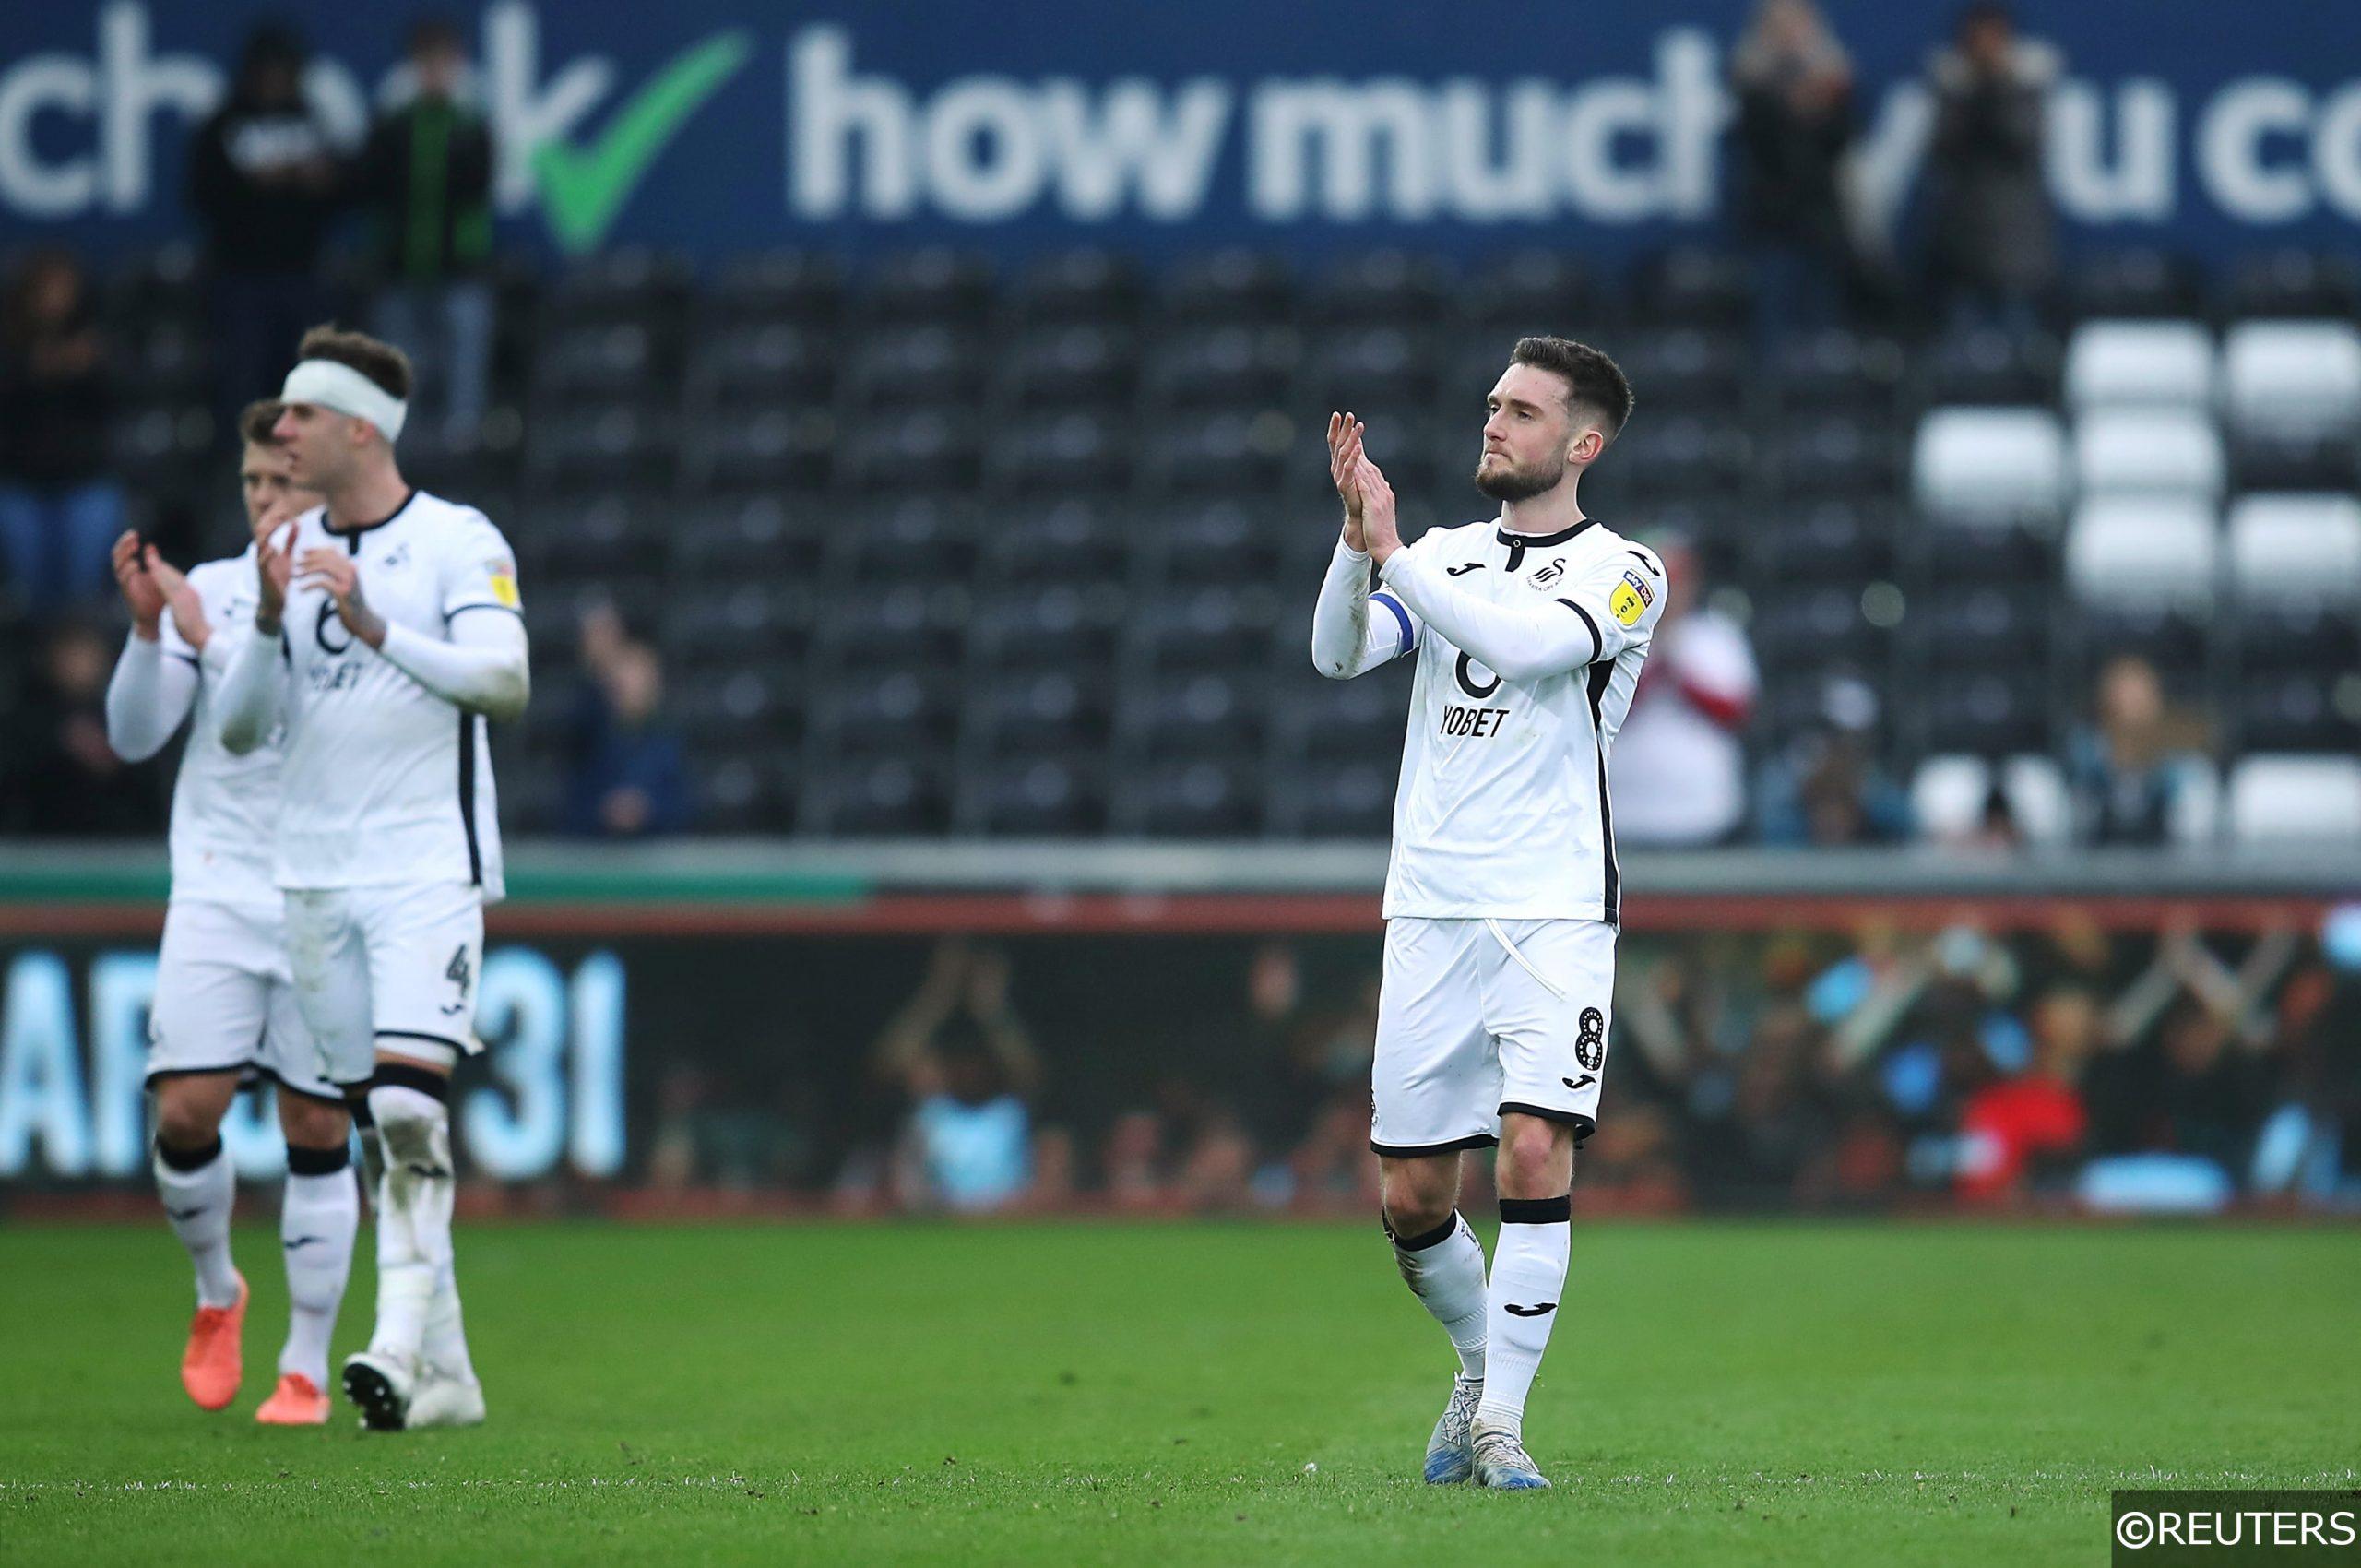 Swansea City post-game